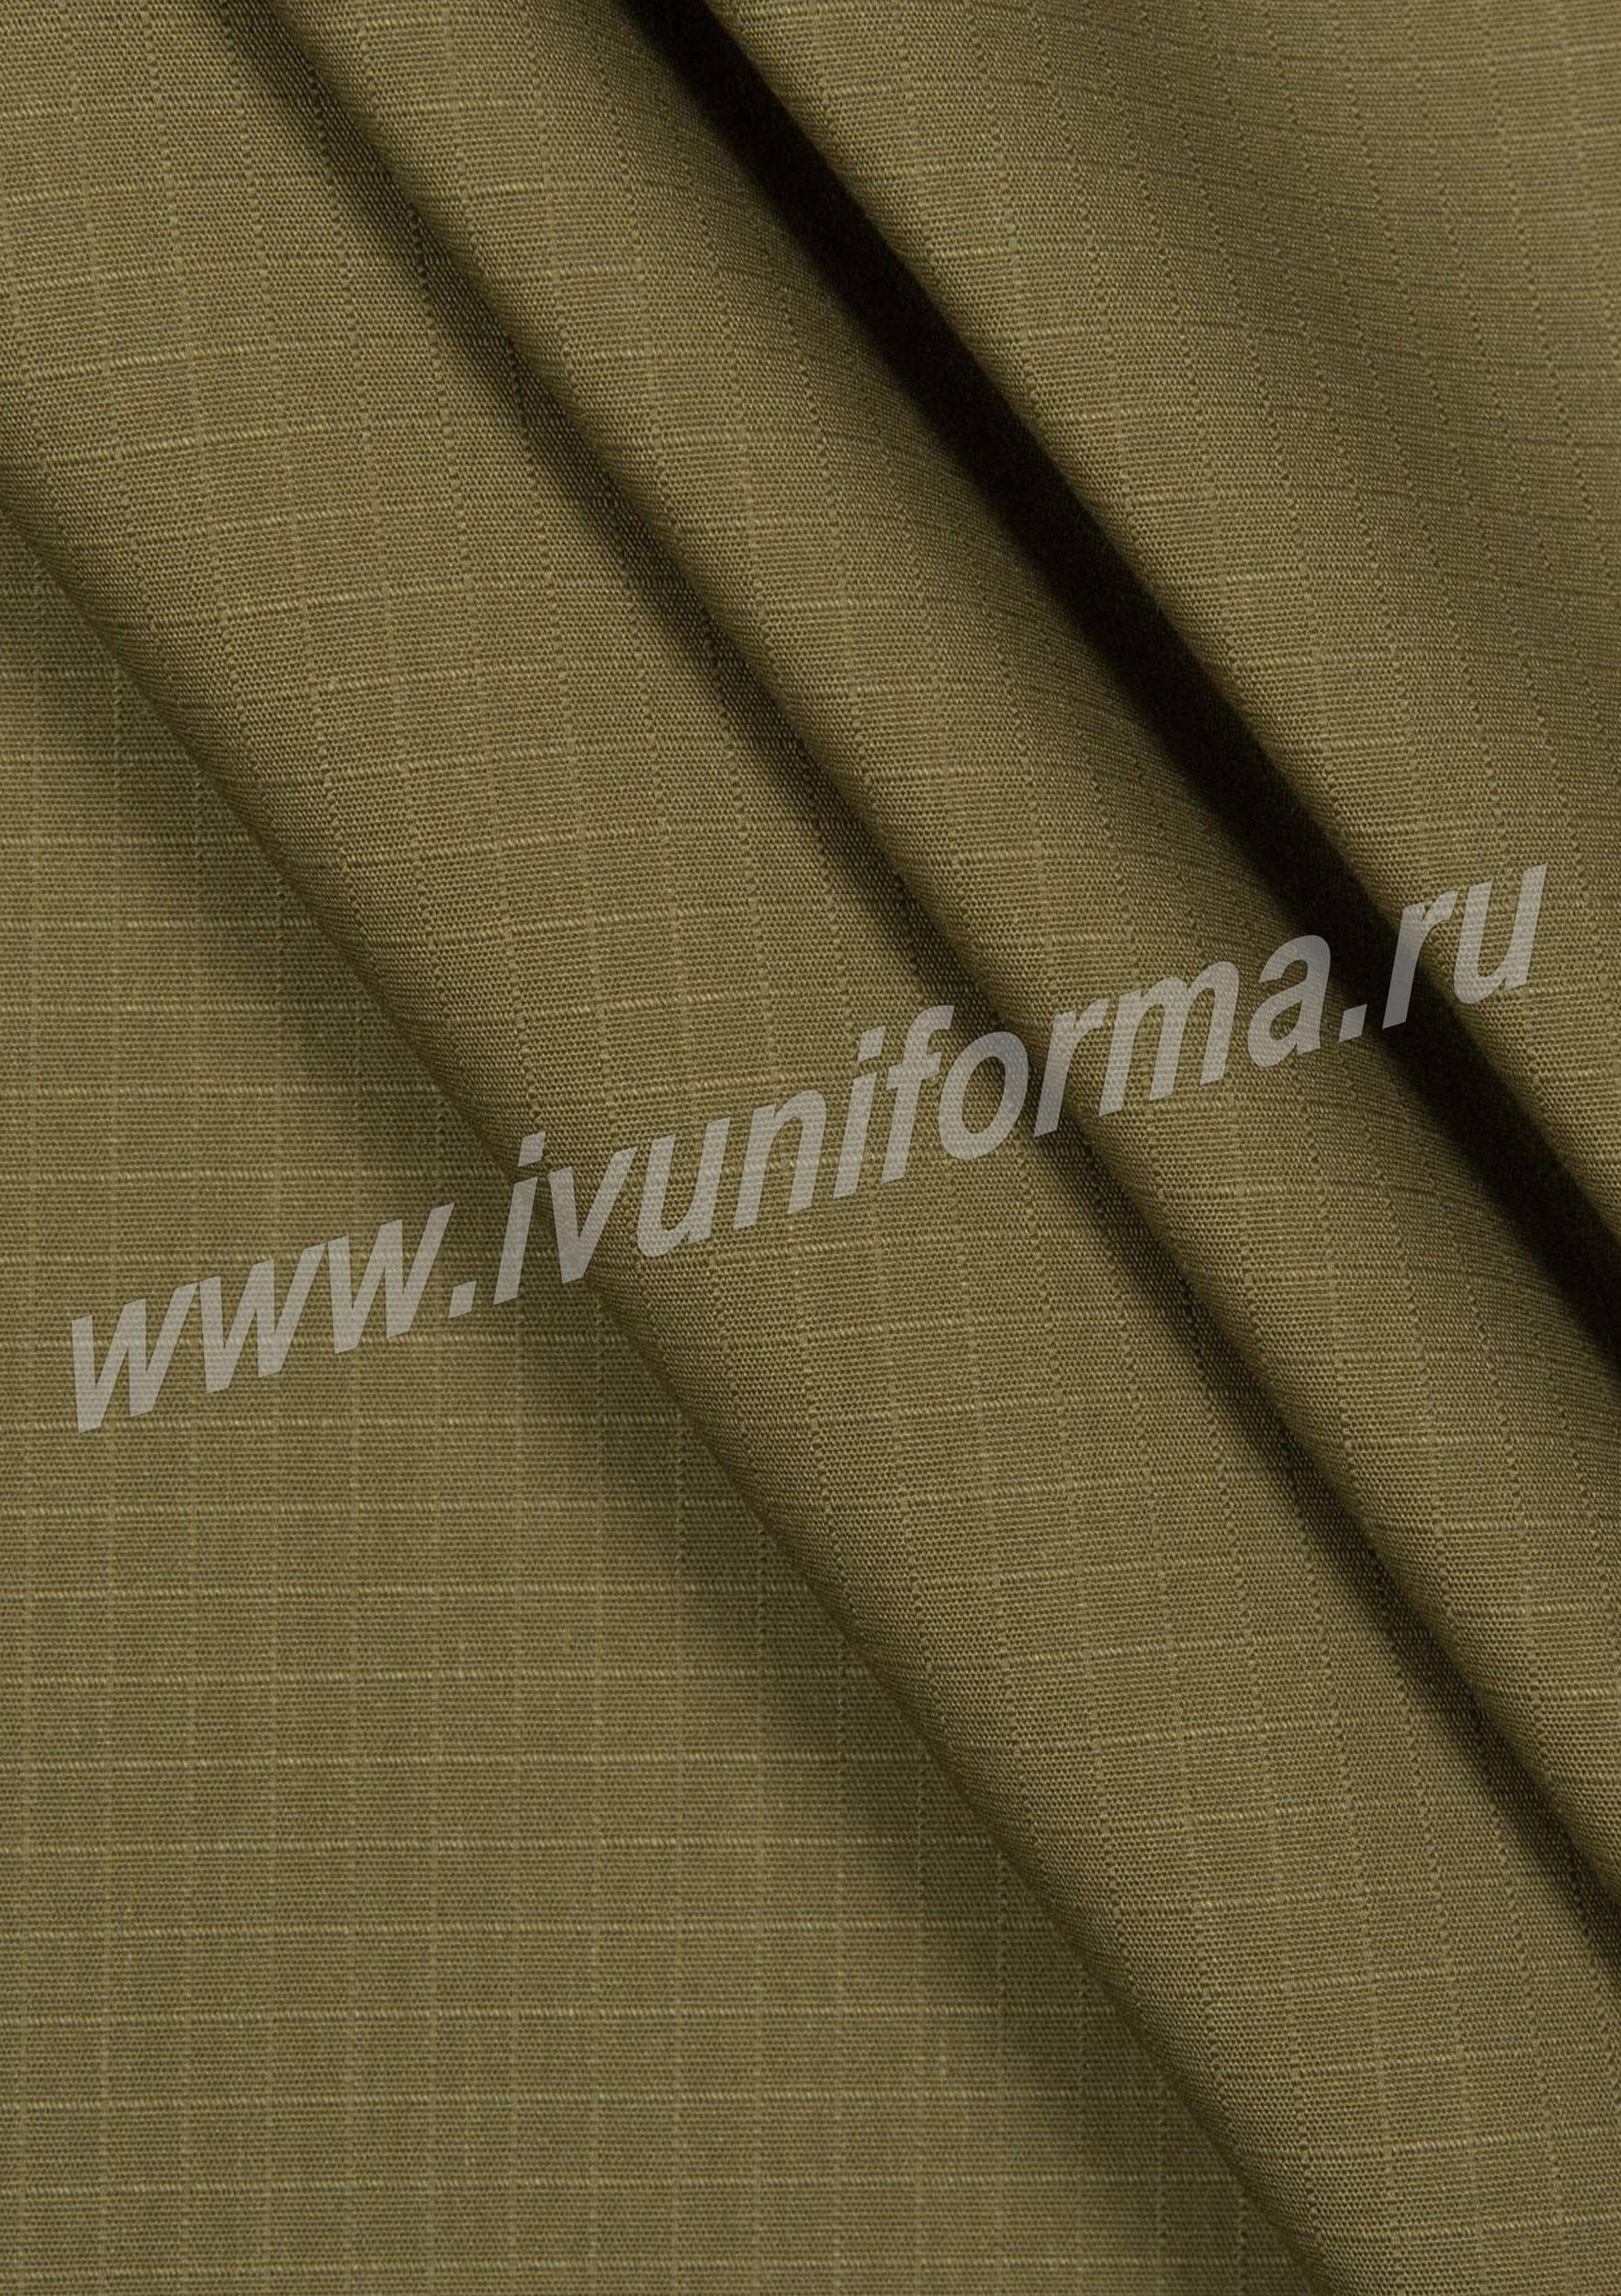 Описание ткани рип-стоп: структура, модификации, преимущества